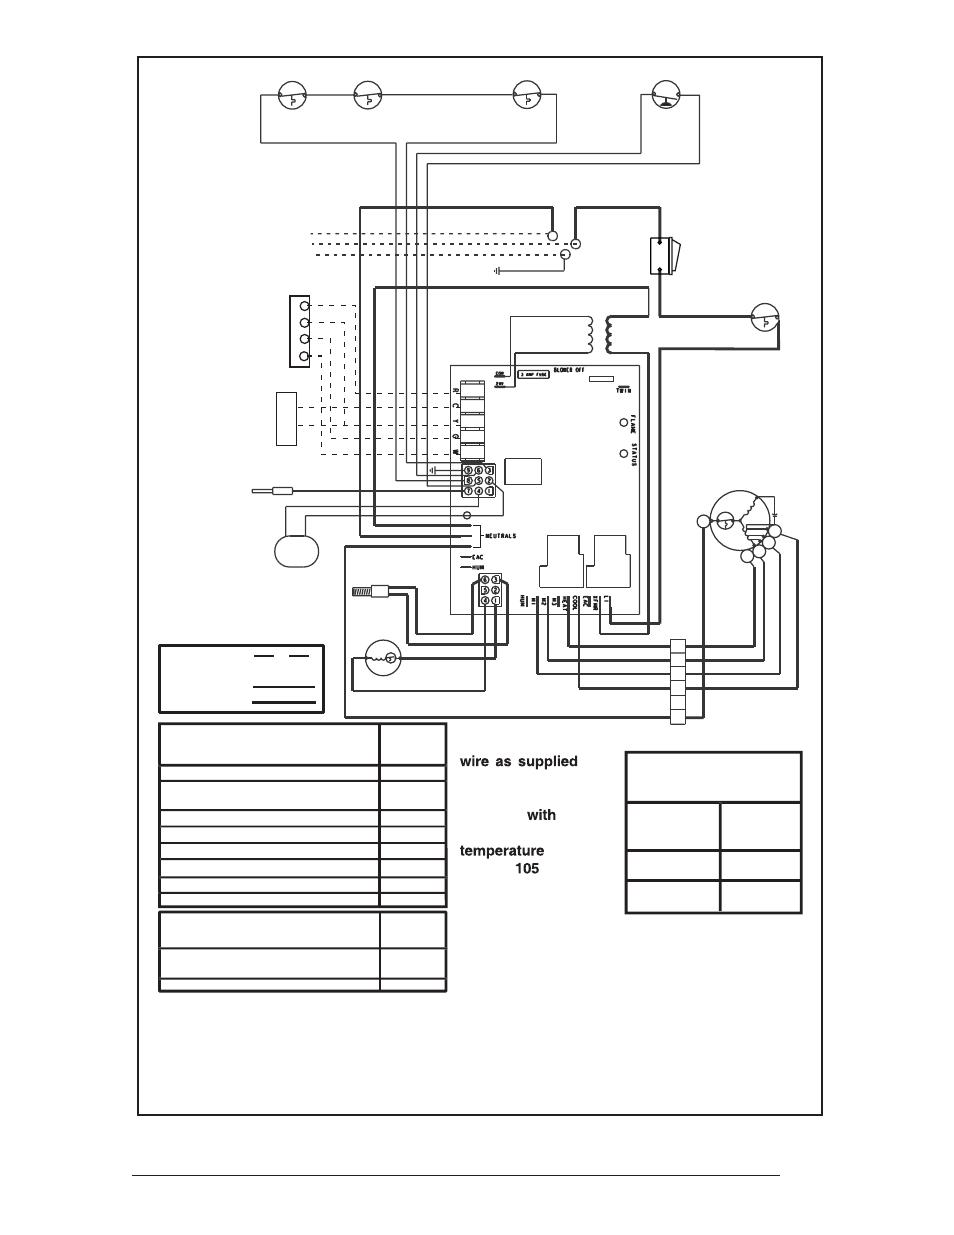 hight resolution of 33 figure 30 downflow furnace wiring diagram legend nordyne33 figure 30 downflow furnace wiring diagram